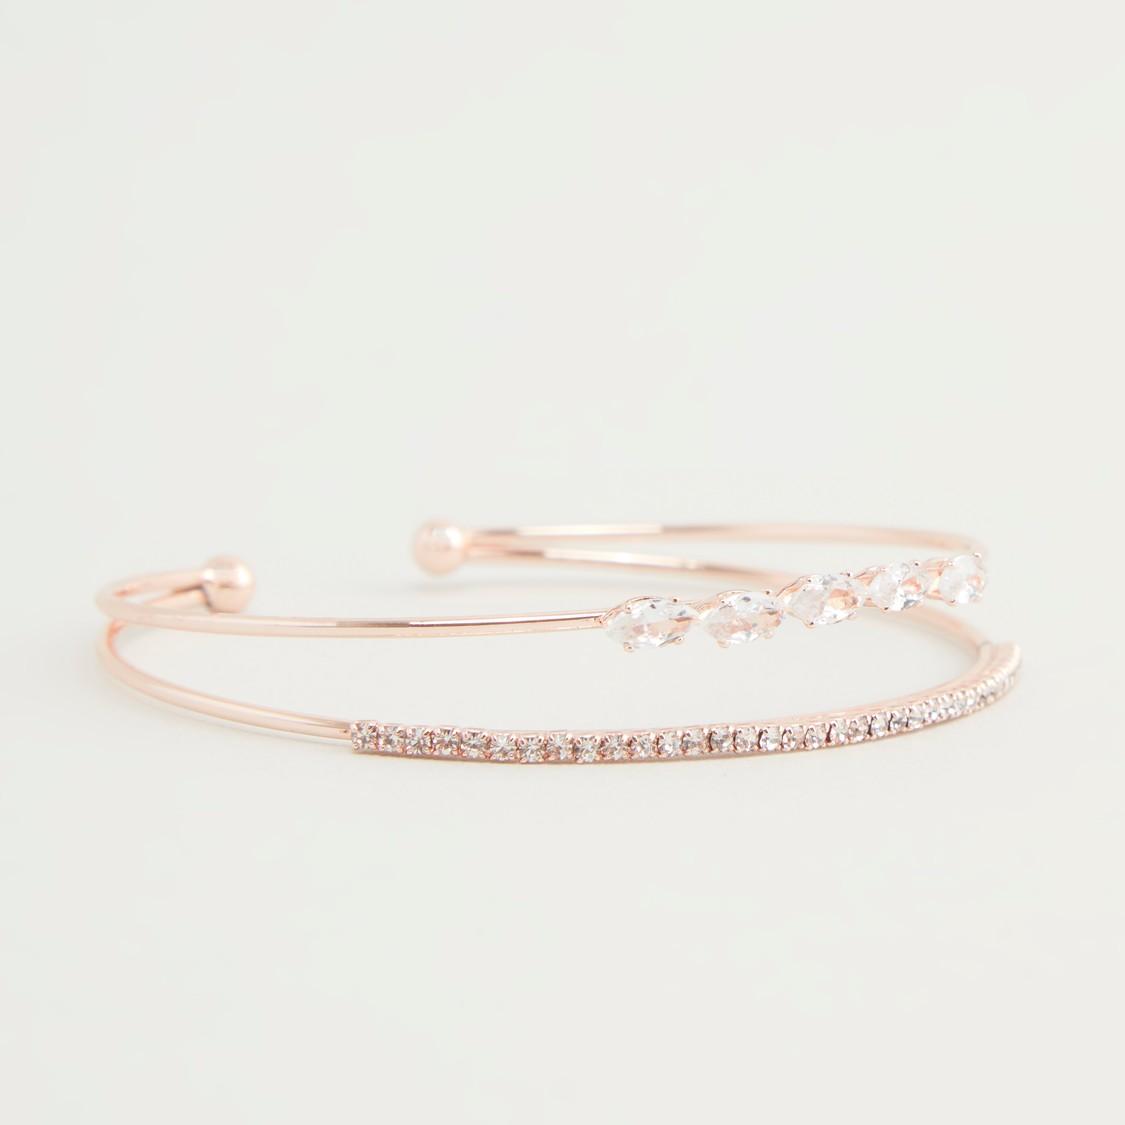 Studded Adjustable Cuff Bracelet